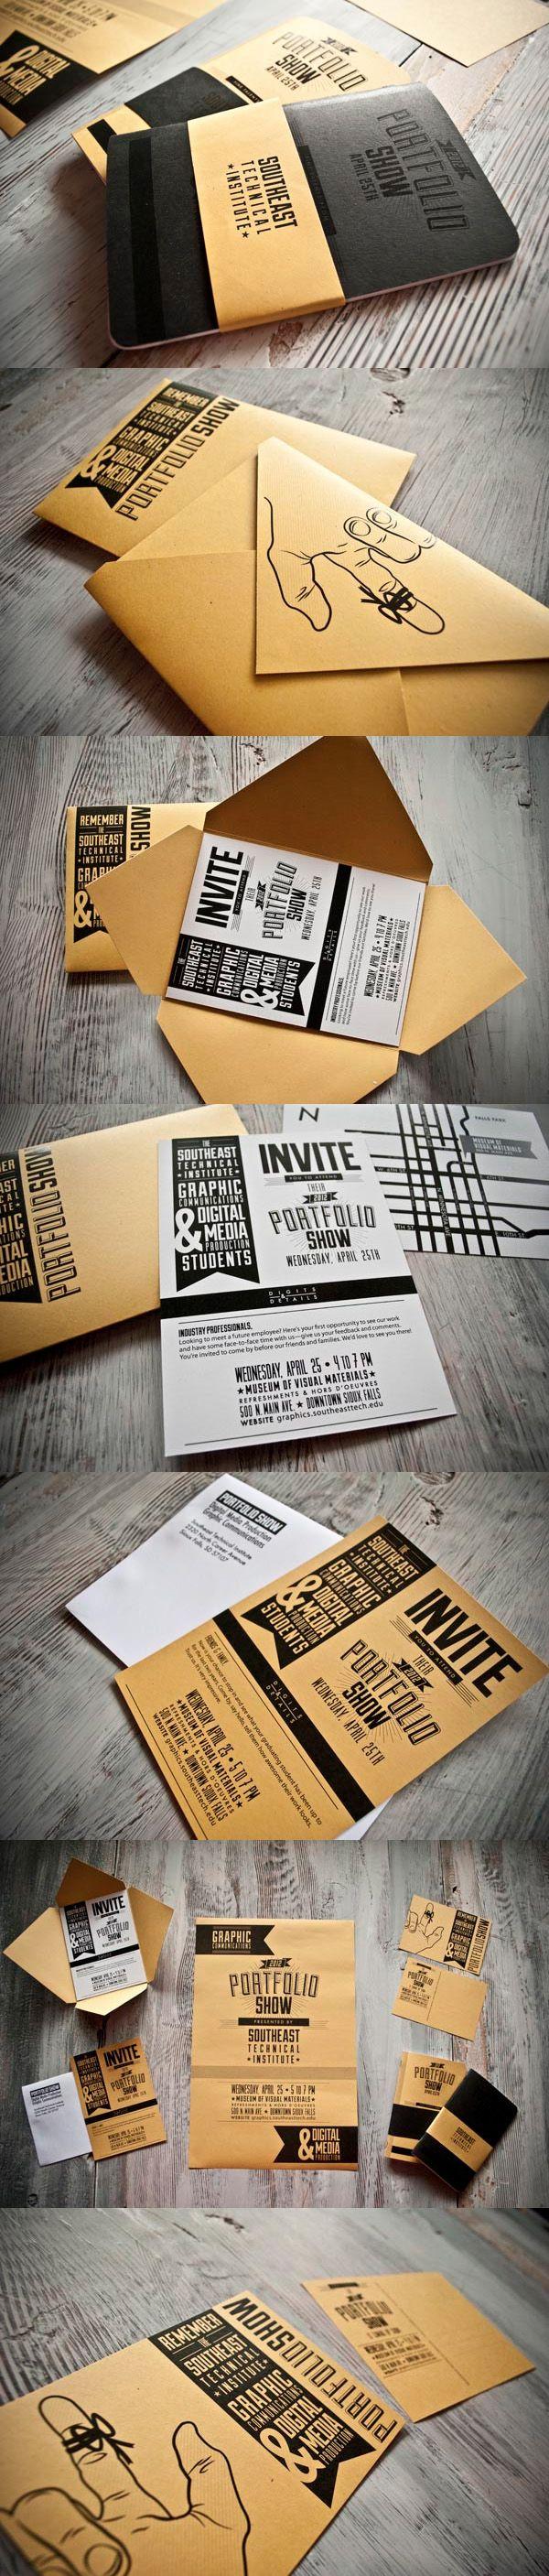 Southeast Technical Institute Portfolio Show  //  #PrintDesign #GraphicDesign #Inspiration